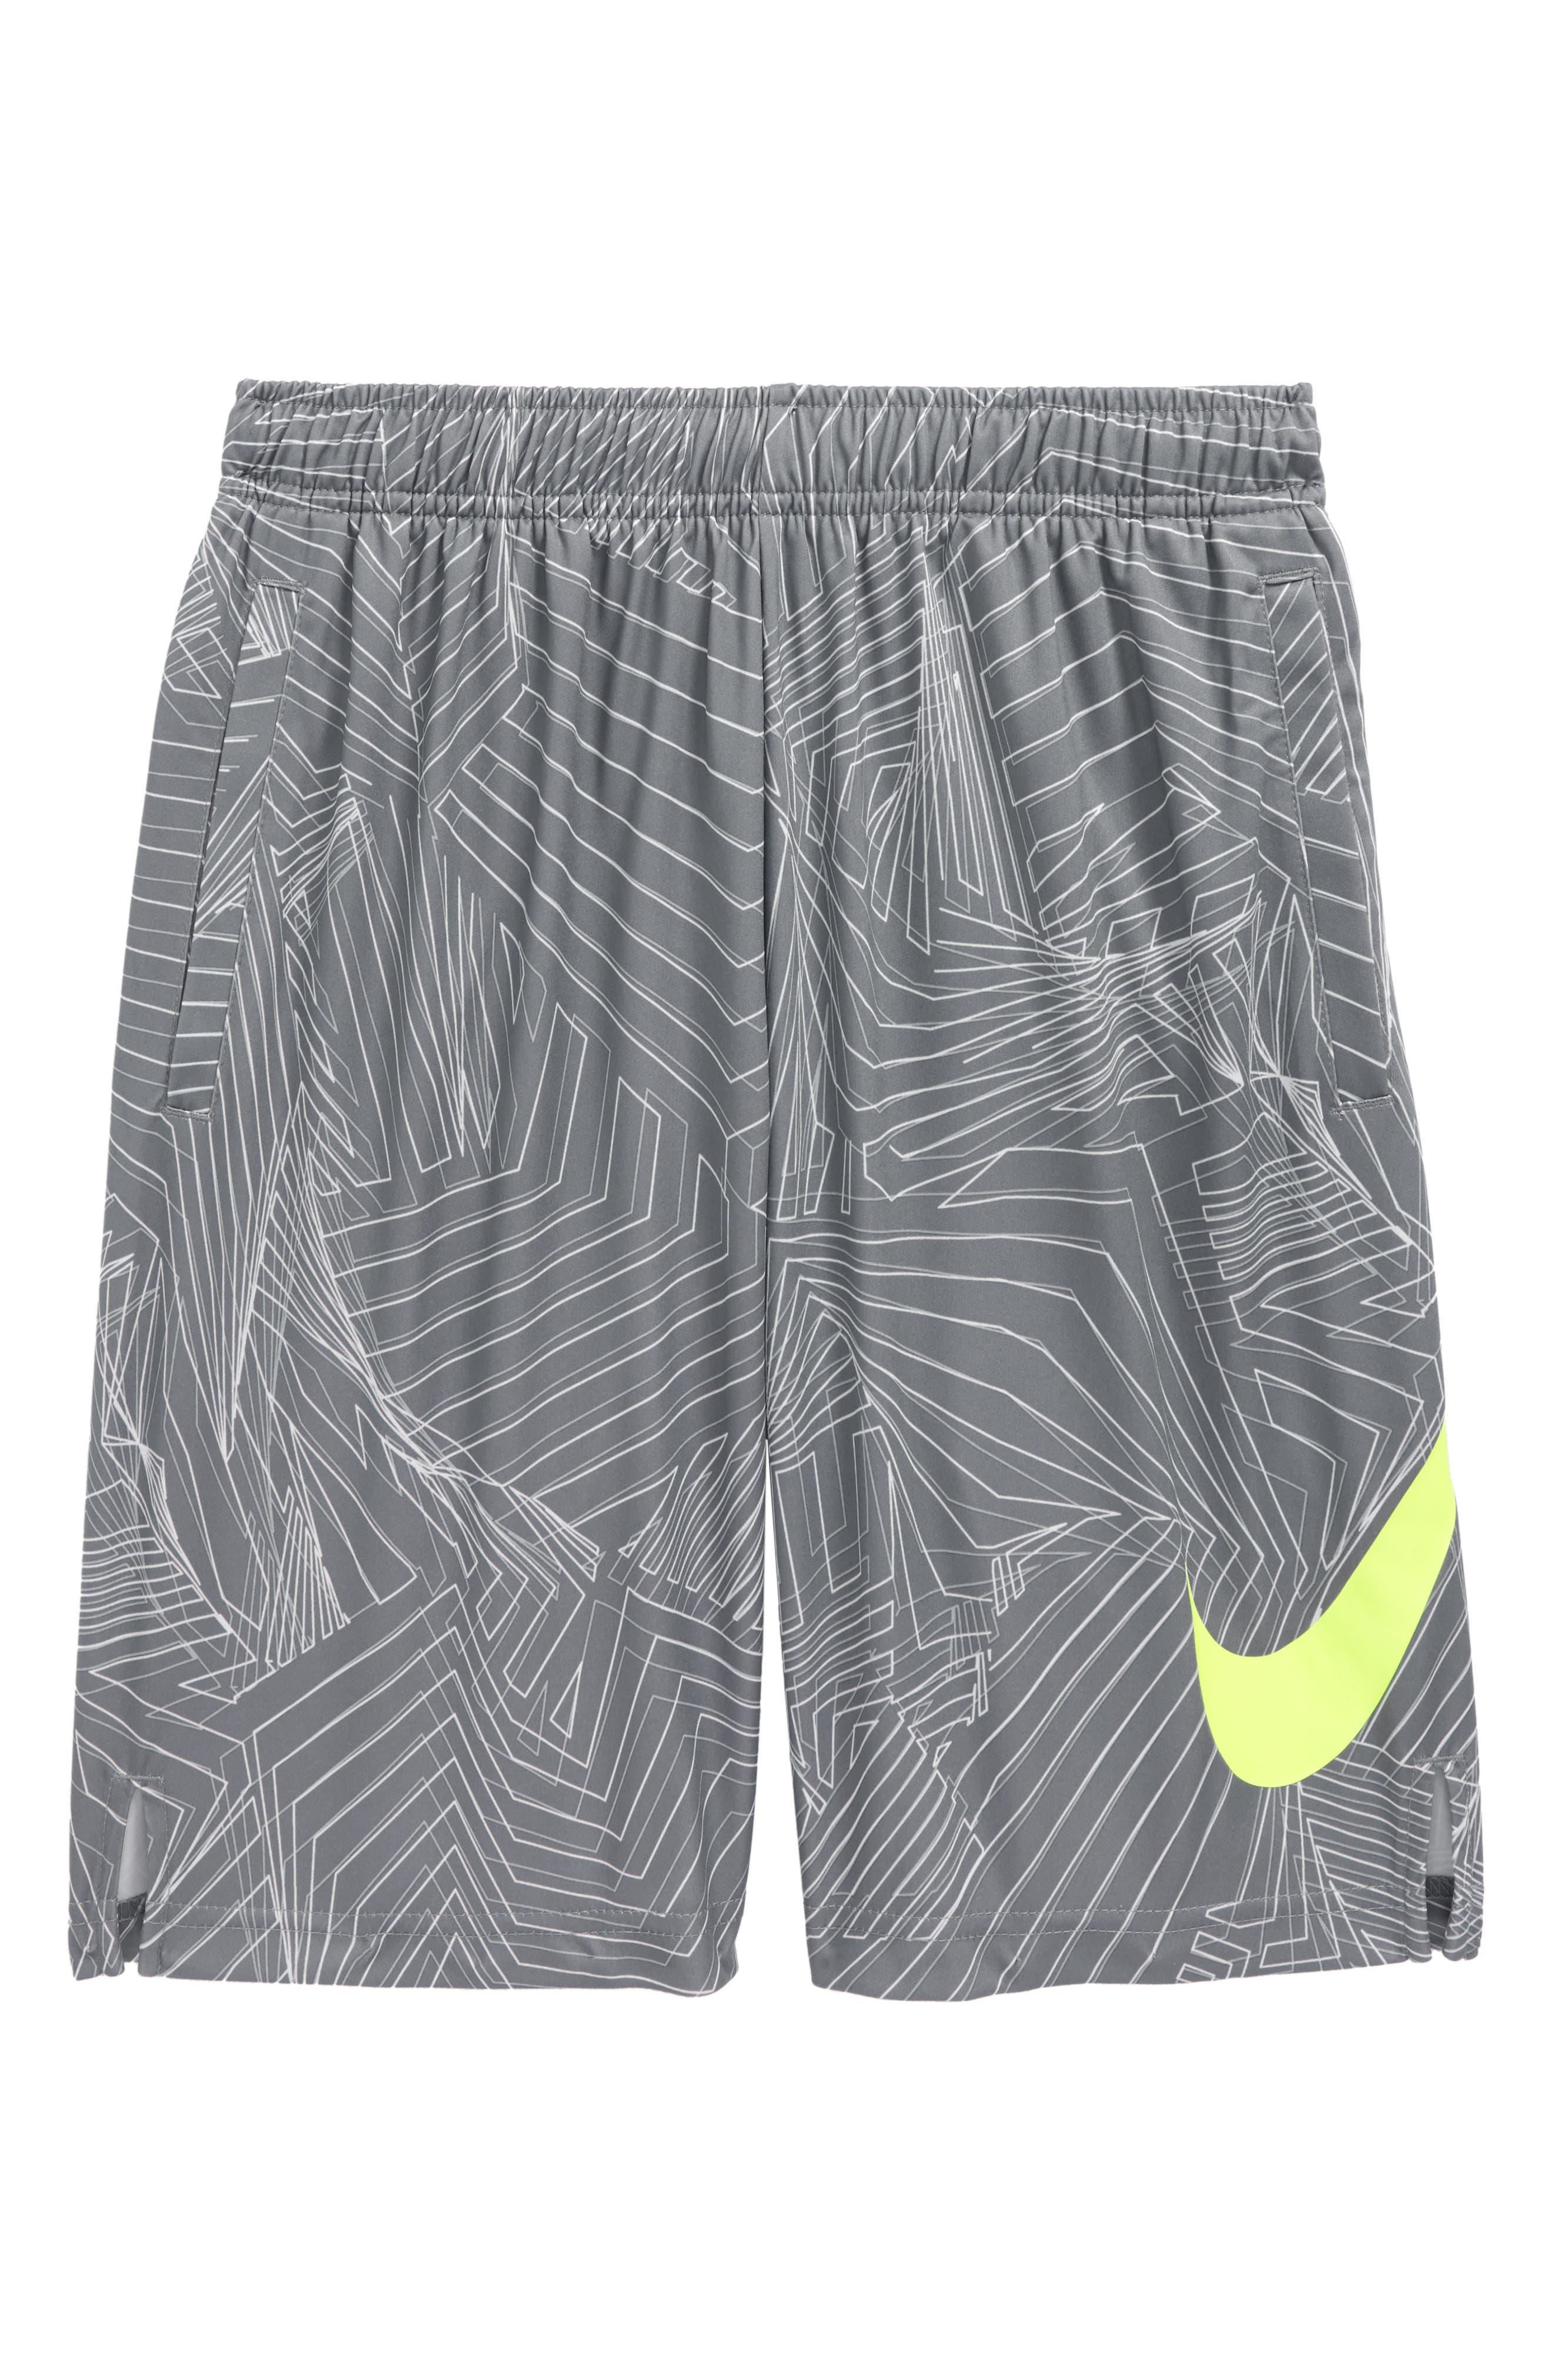 Dry Training Shorts,                             Main thumbnail 1, color,